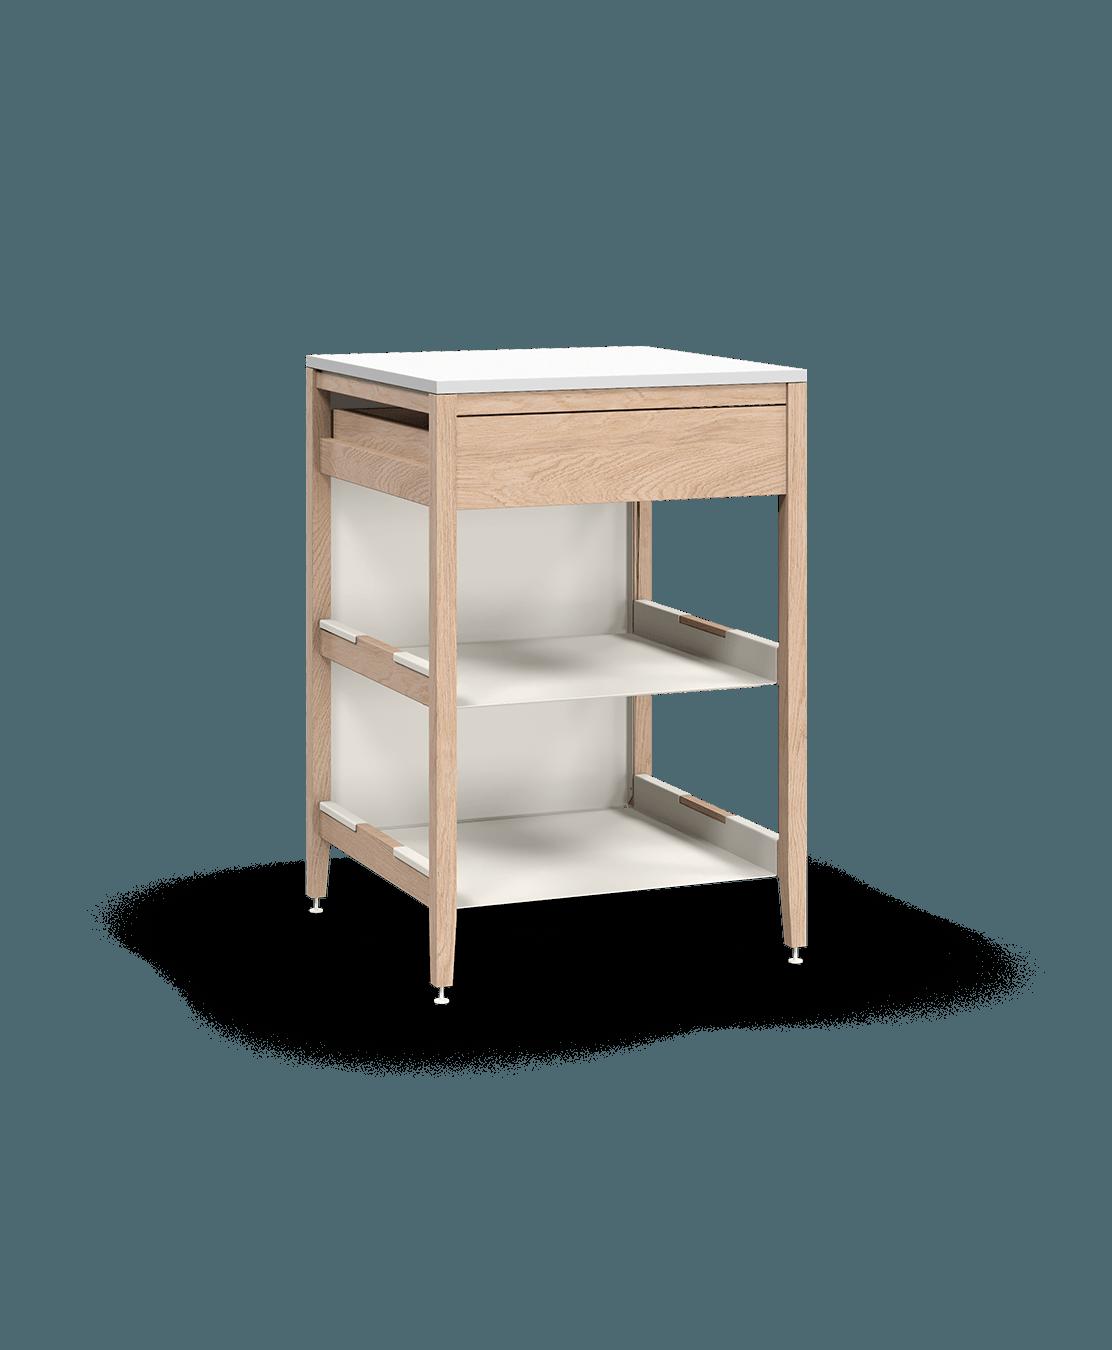 coquo radix white oak solid wood modular 2 shelves 1 drawer base kitchen cabinet 27 inch C1-C-27TB-1023-NA